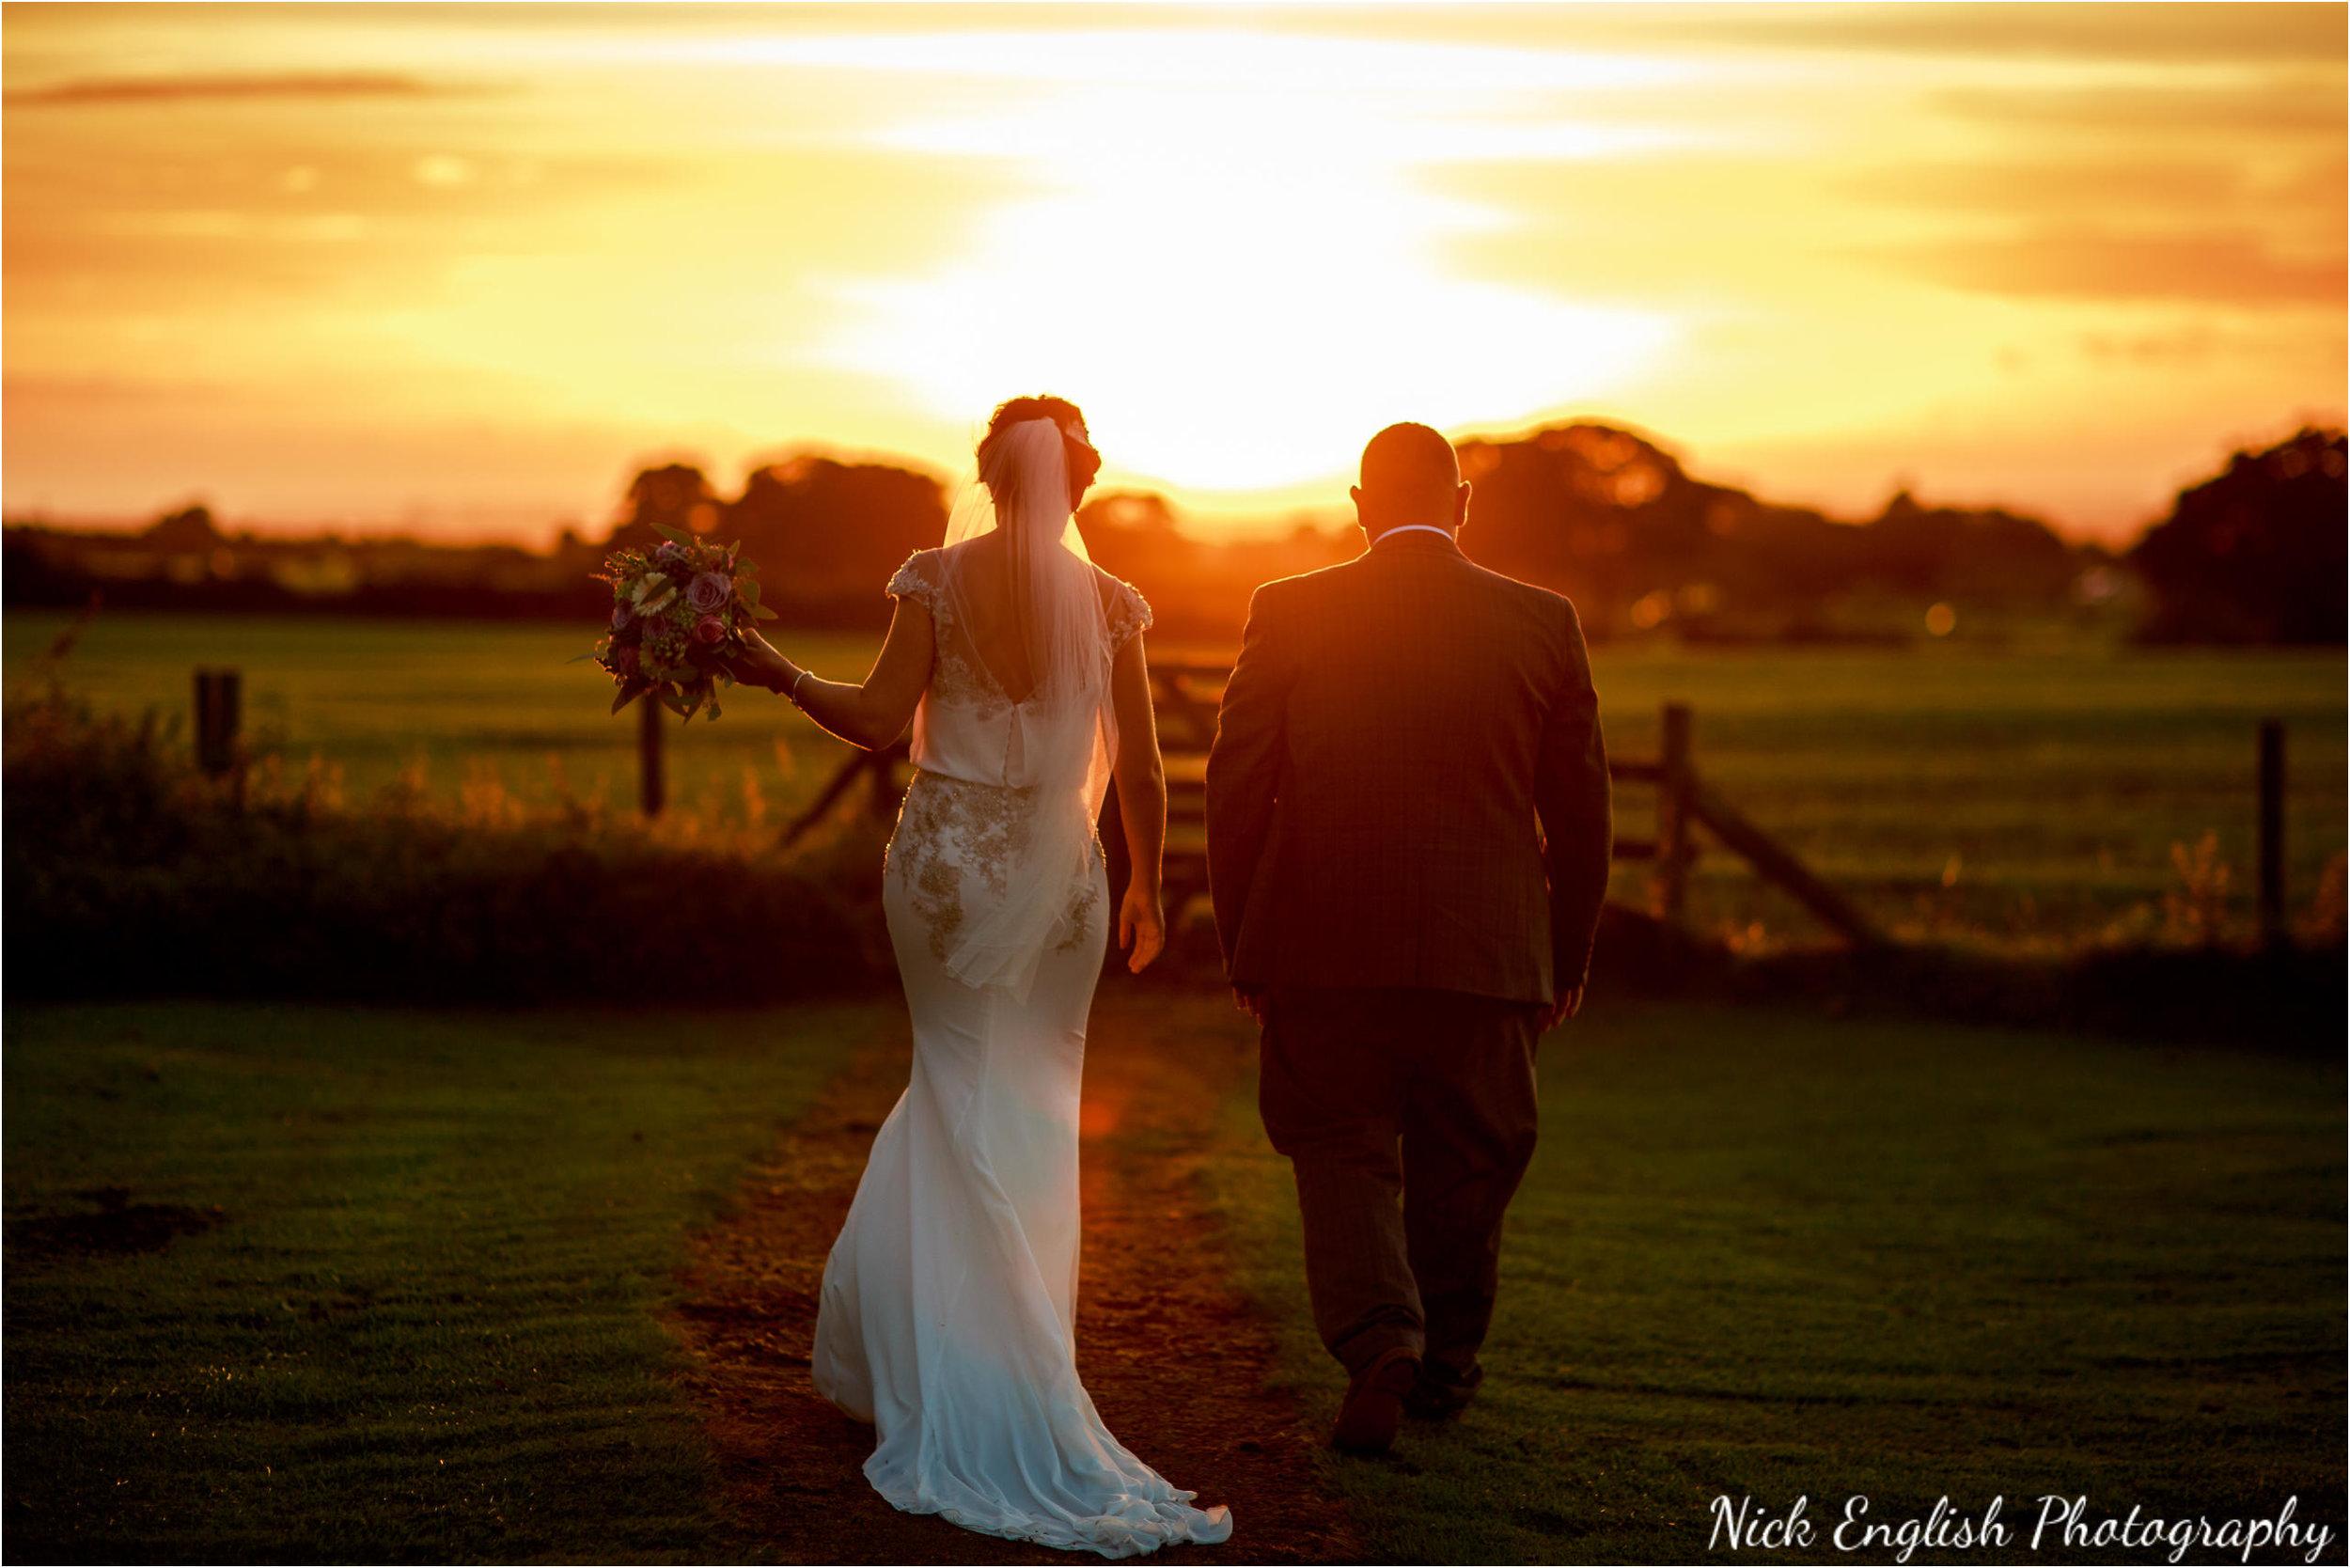 Stacey-Ash-Wedding-Photographs-Stanley-House-Preston-Lancashire-232.jpg